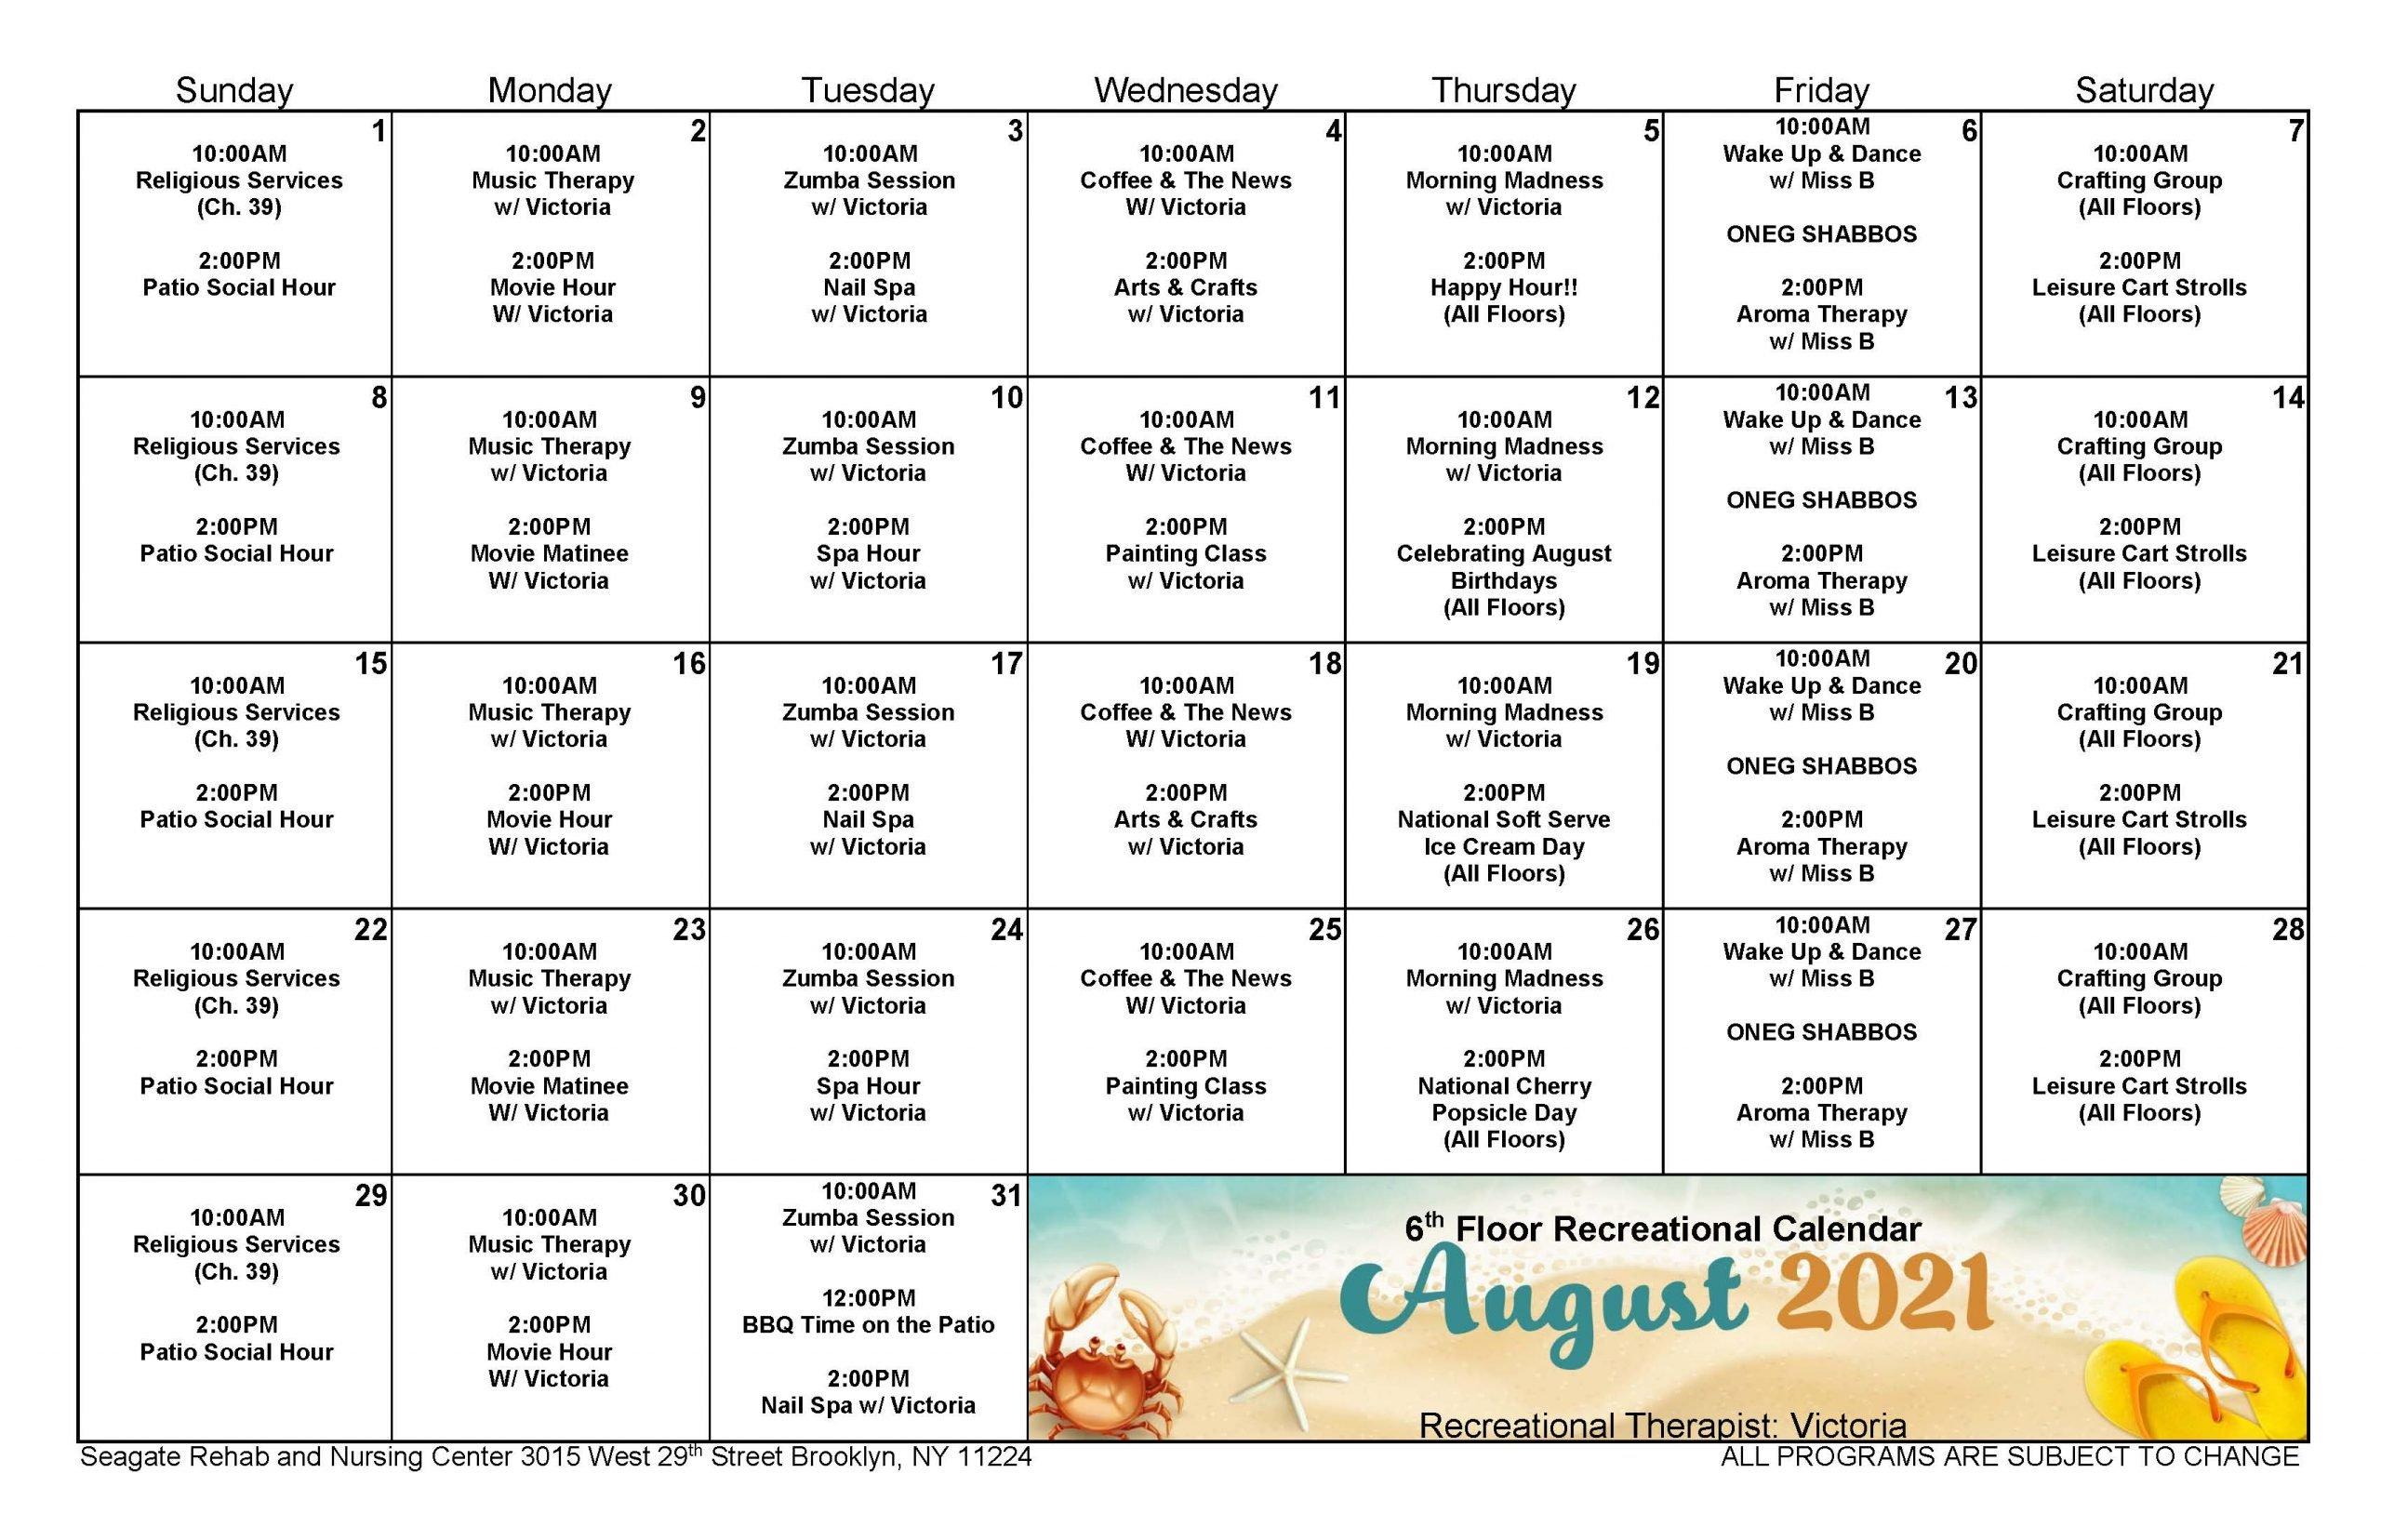 Seagate August Event Calendar for 6th Floor